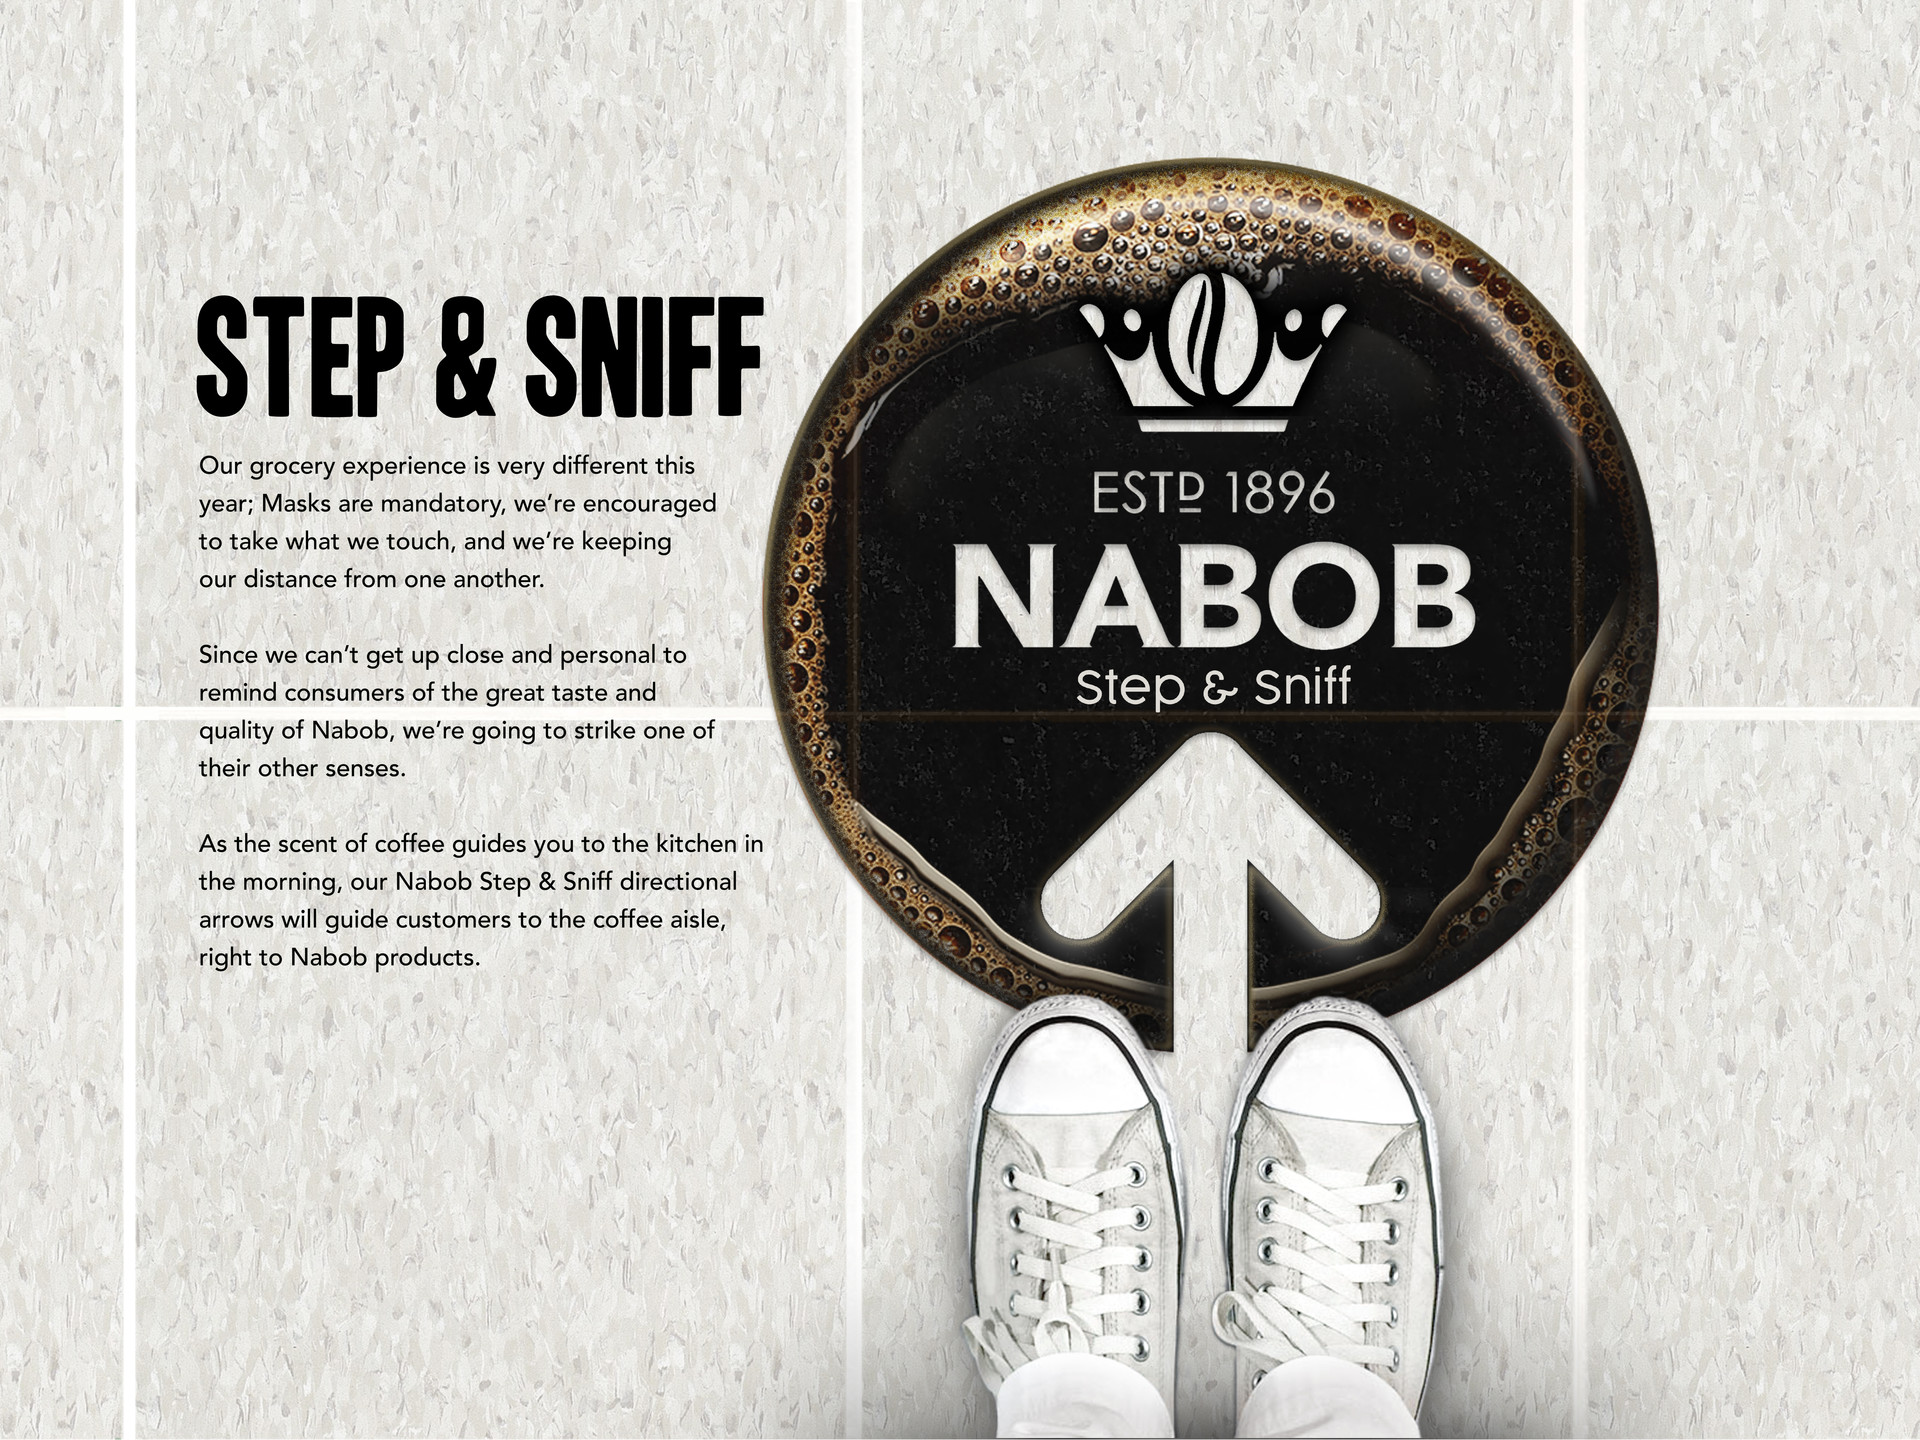 Step & Sniff